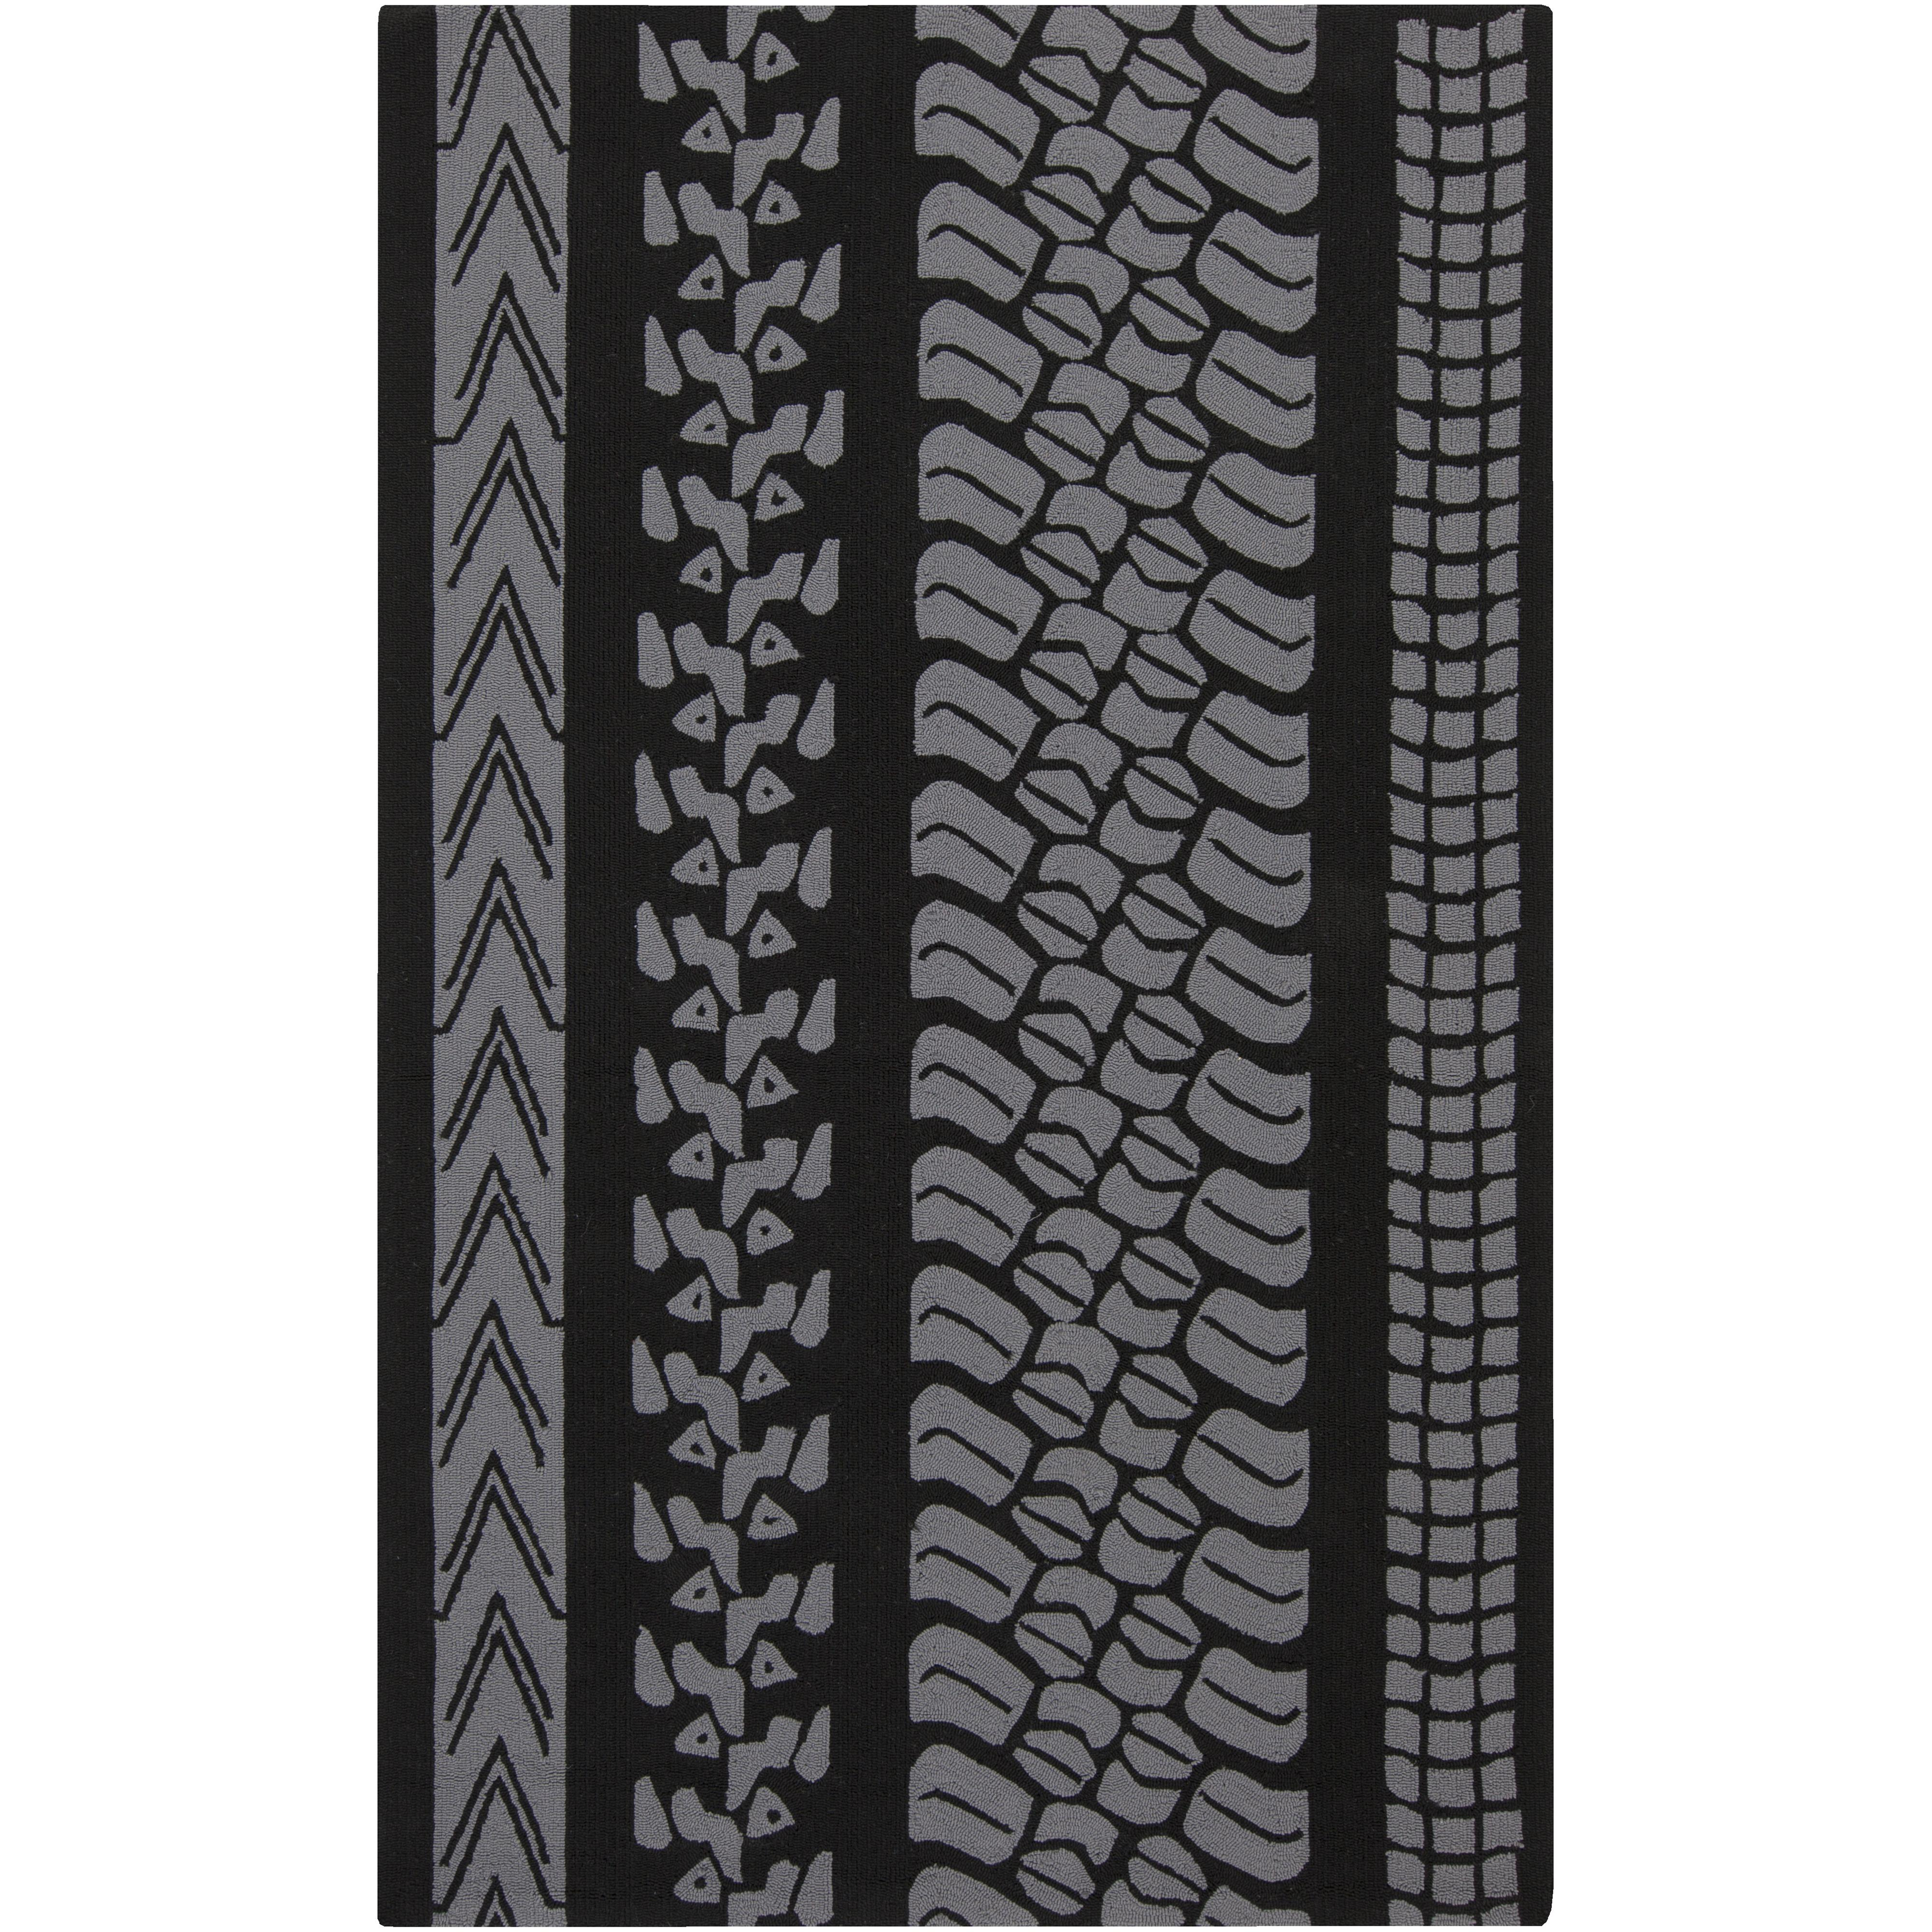 Surya Rugs Pandemonium 9' x 12' - Item Number: PDM1006-912